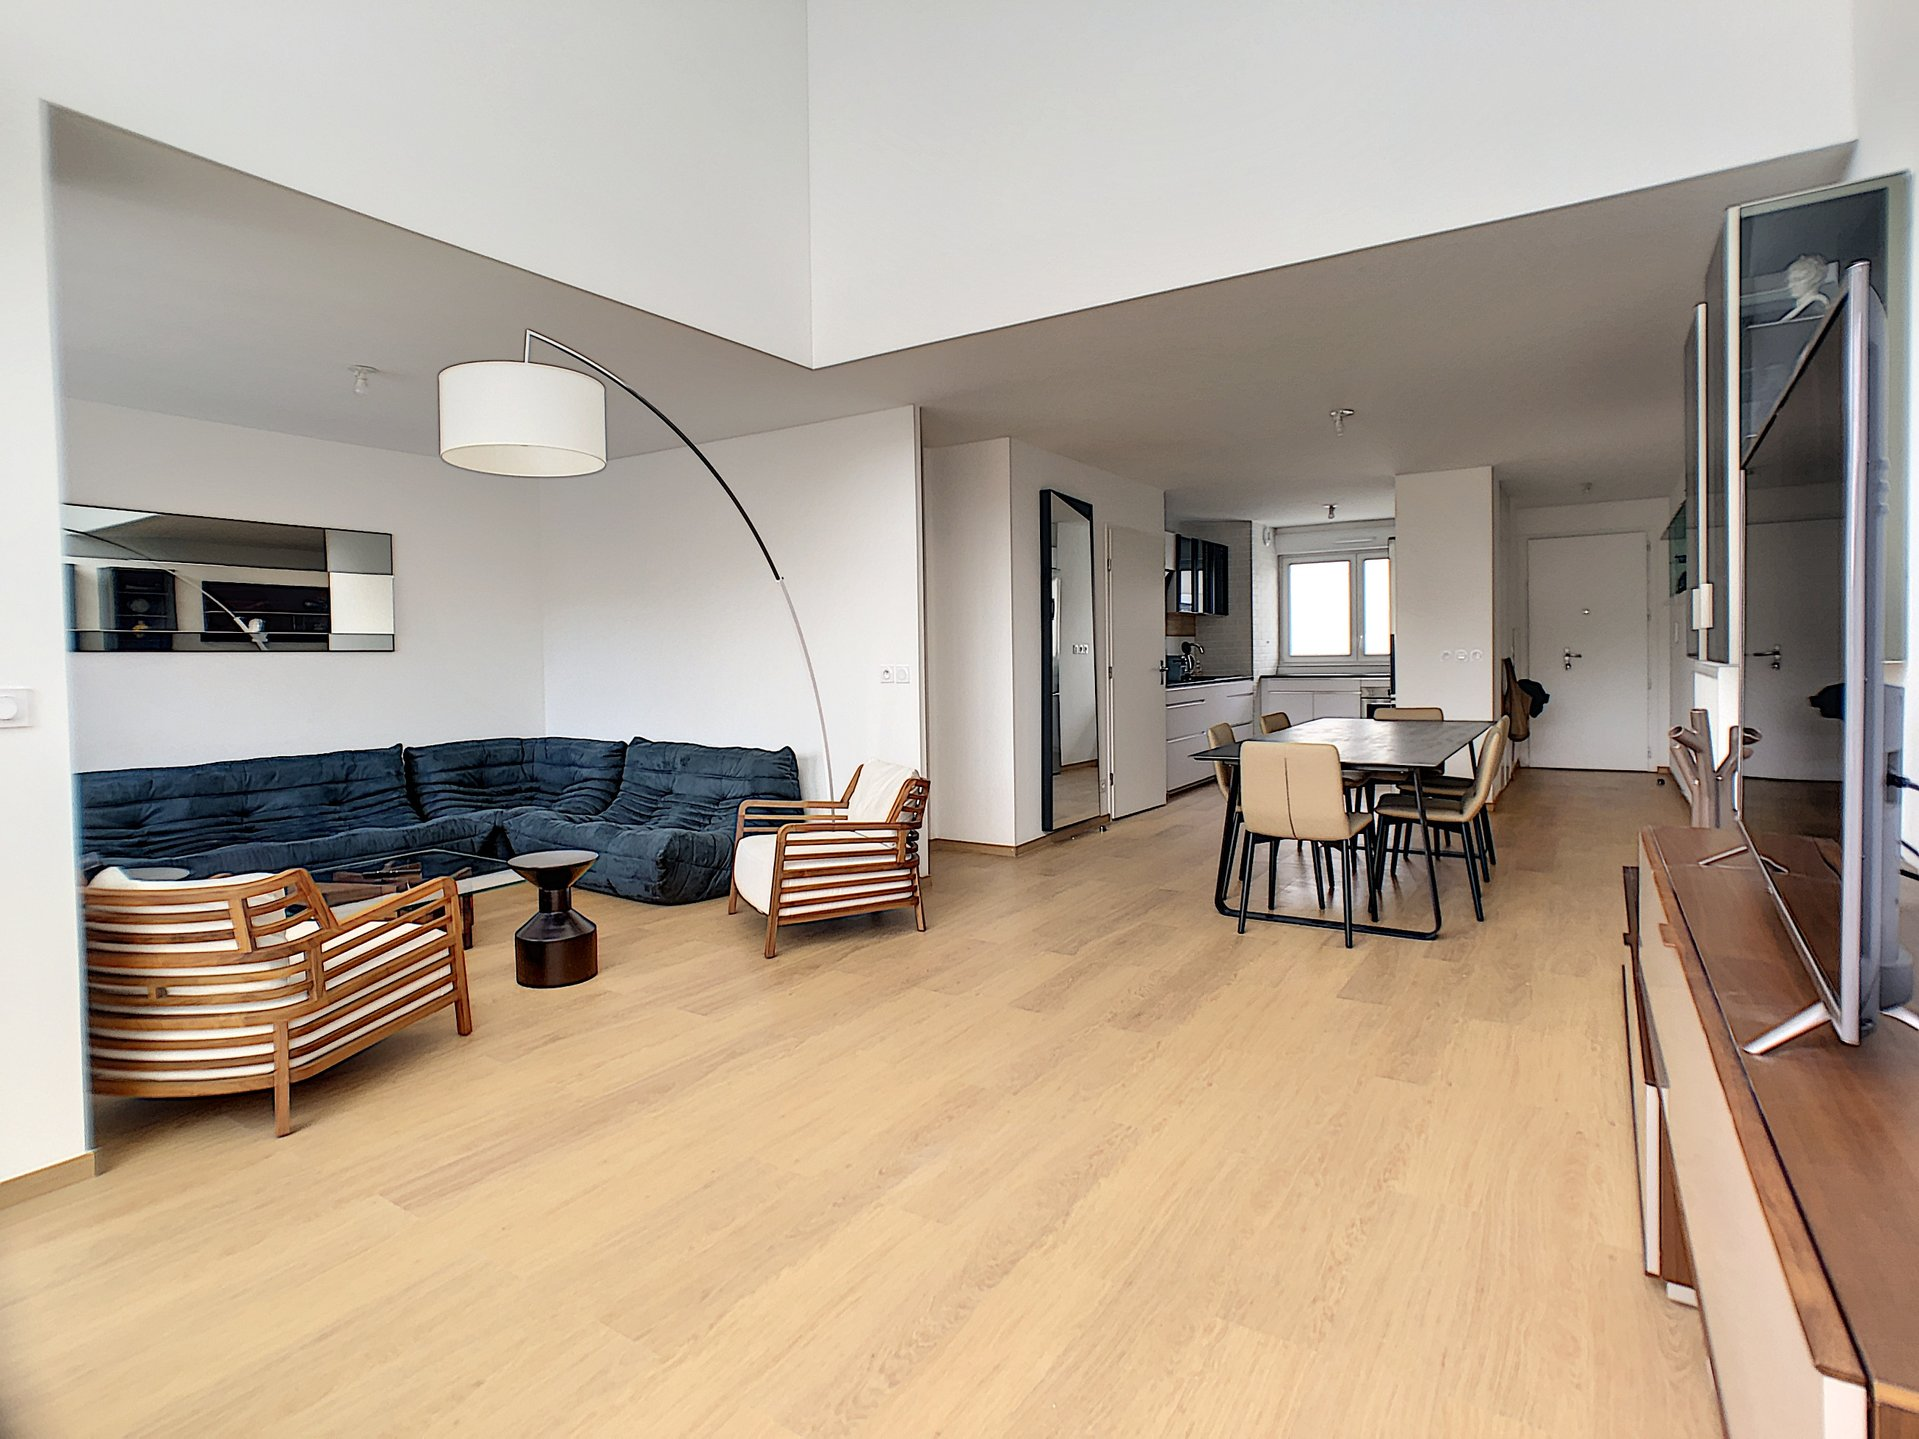 MERIDIA ECO VALLEE,  4 P duplex, denier étage, solarium, parking